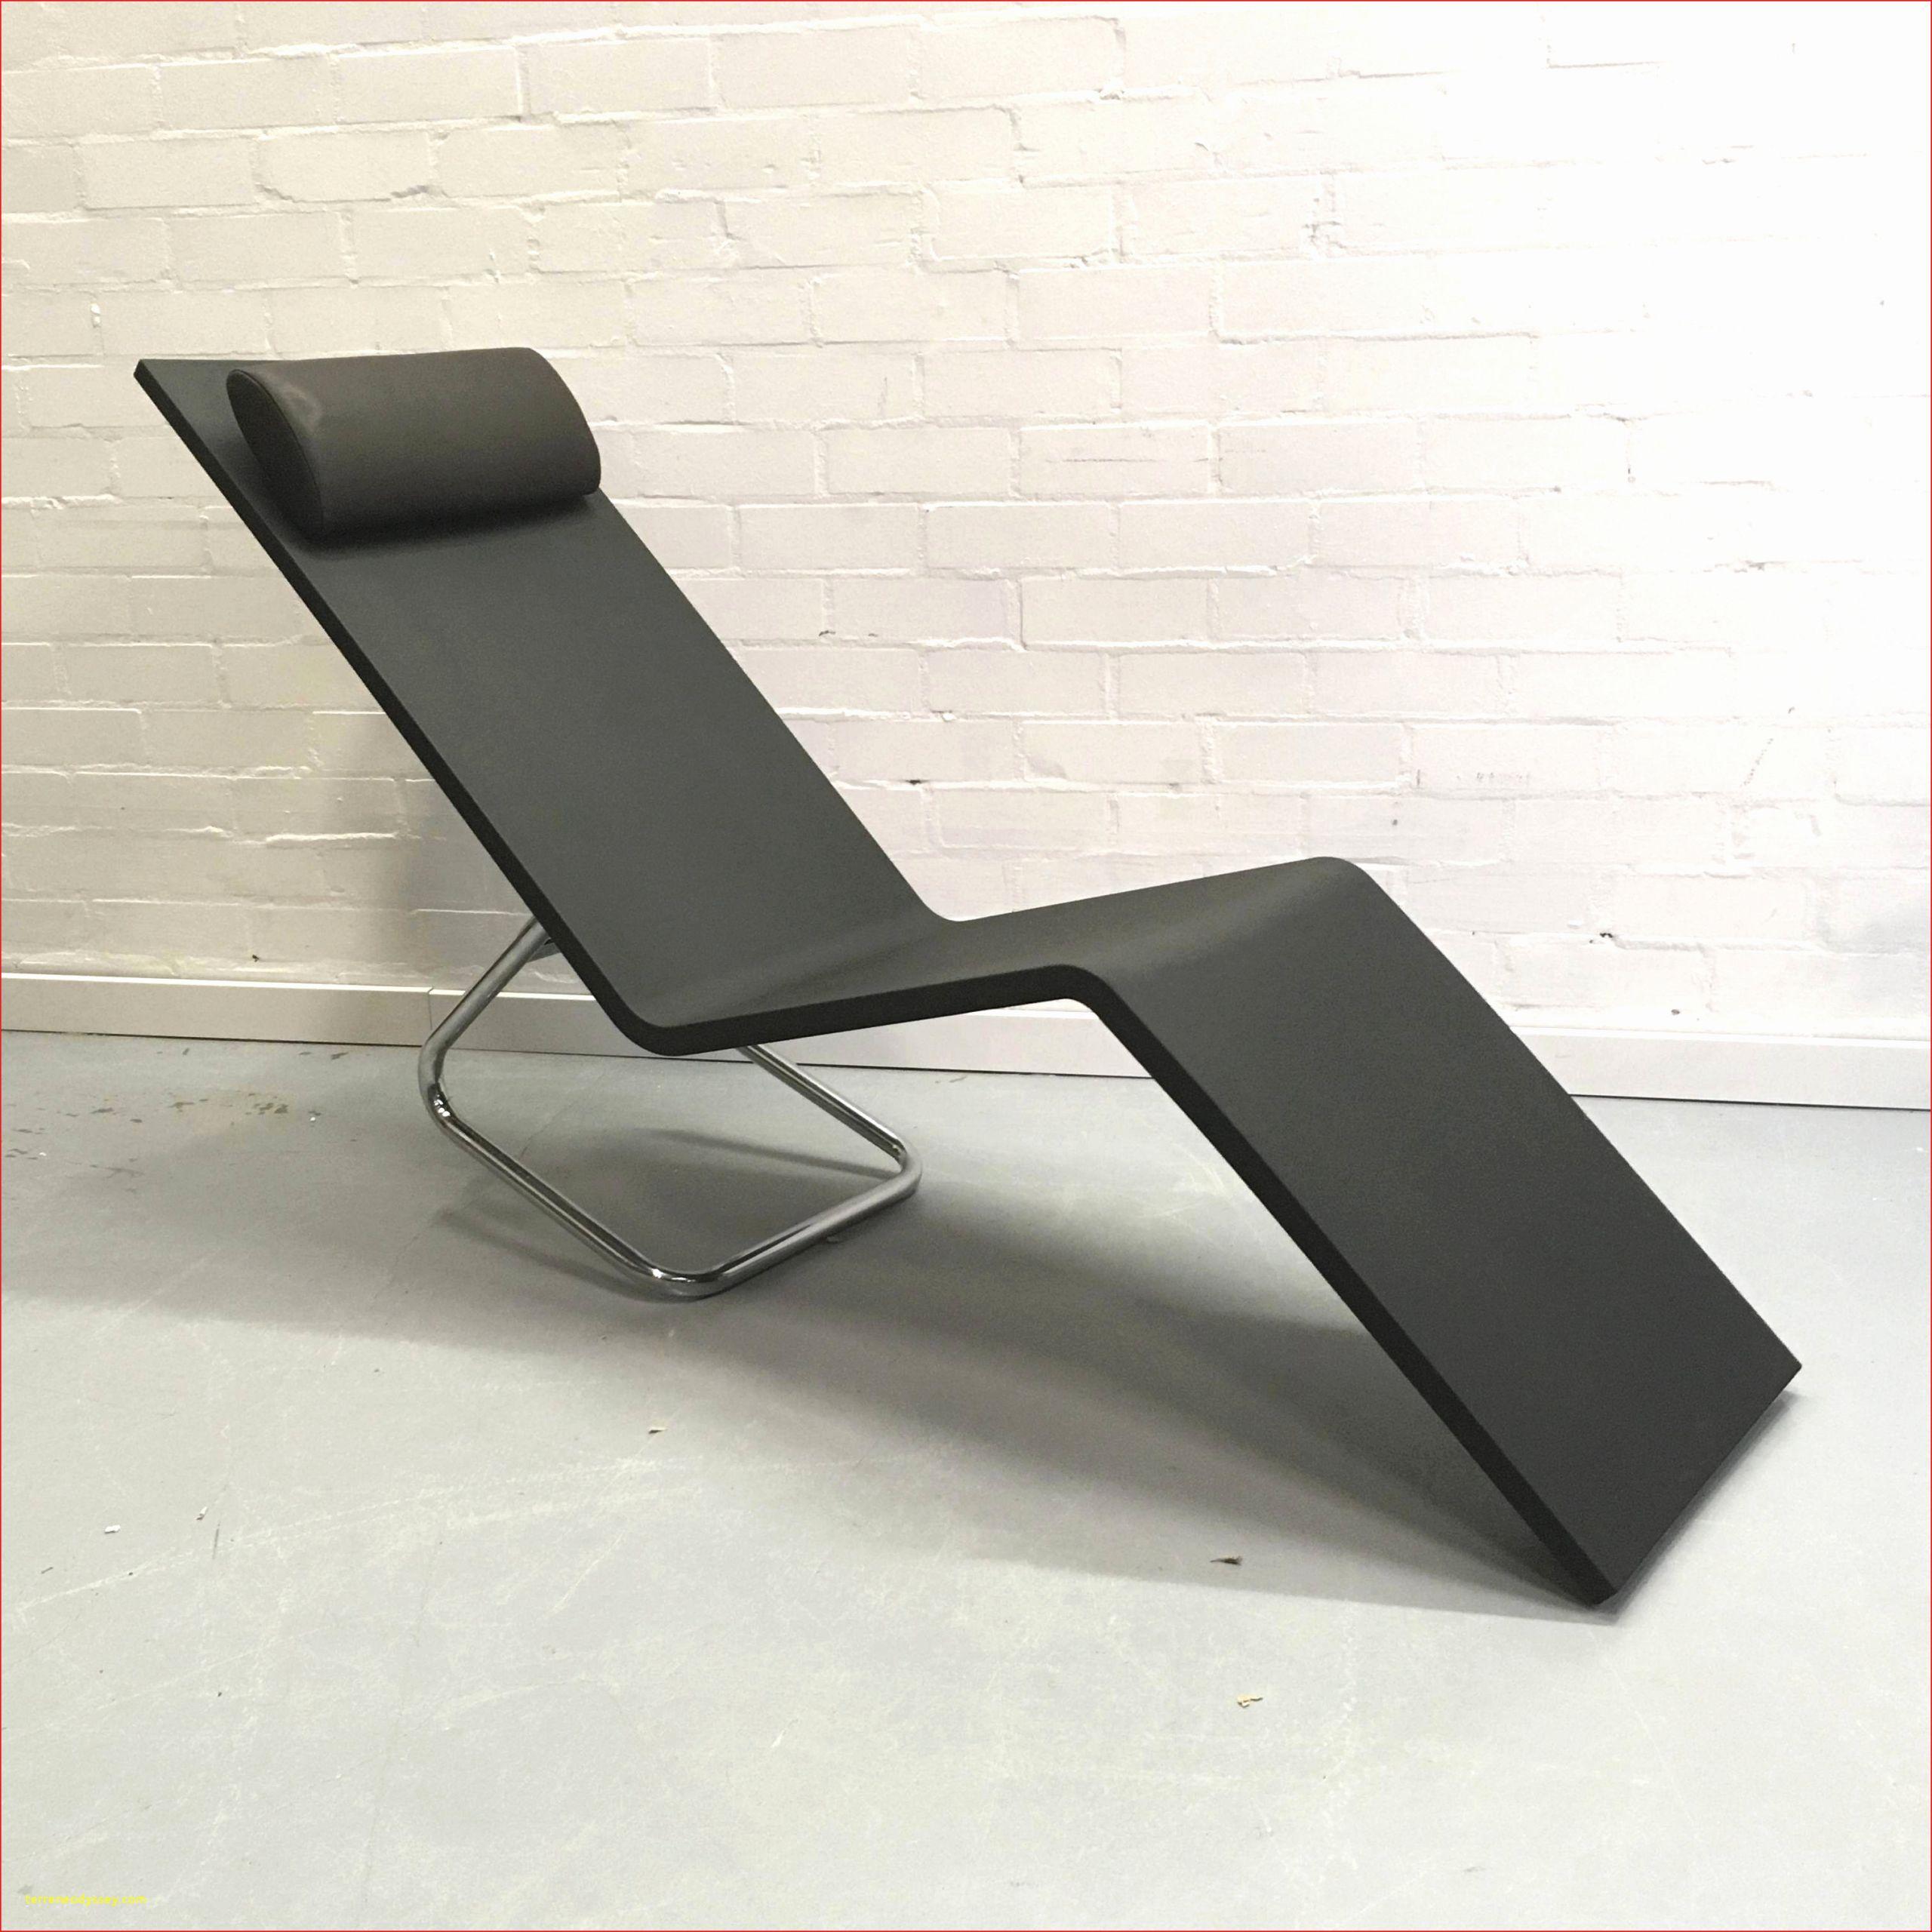 chaise horeca chaise restaurant pas cher occasion of chaise horeca